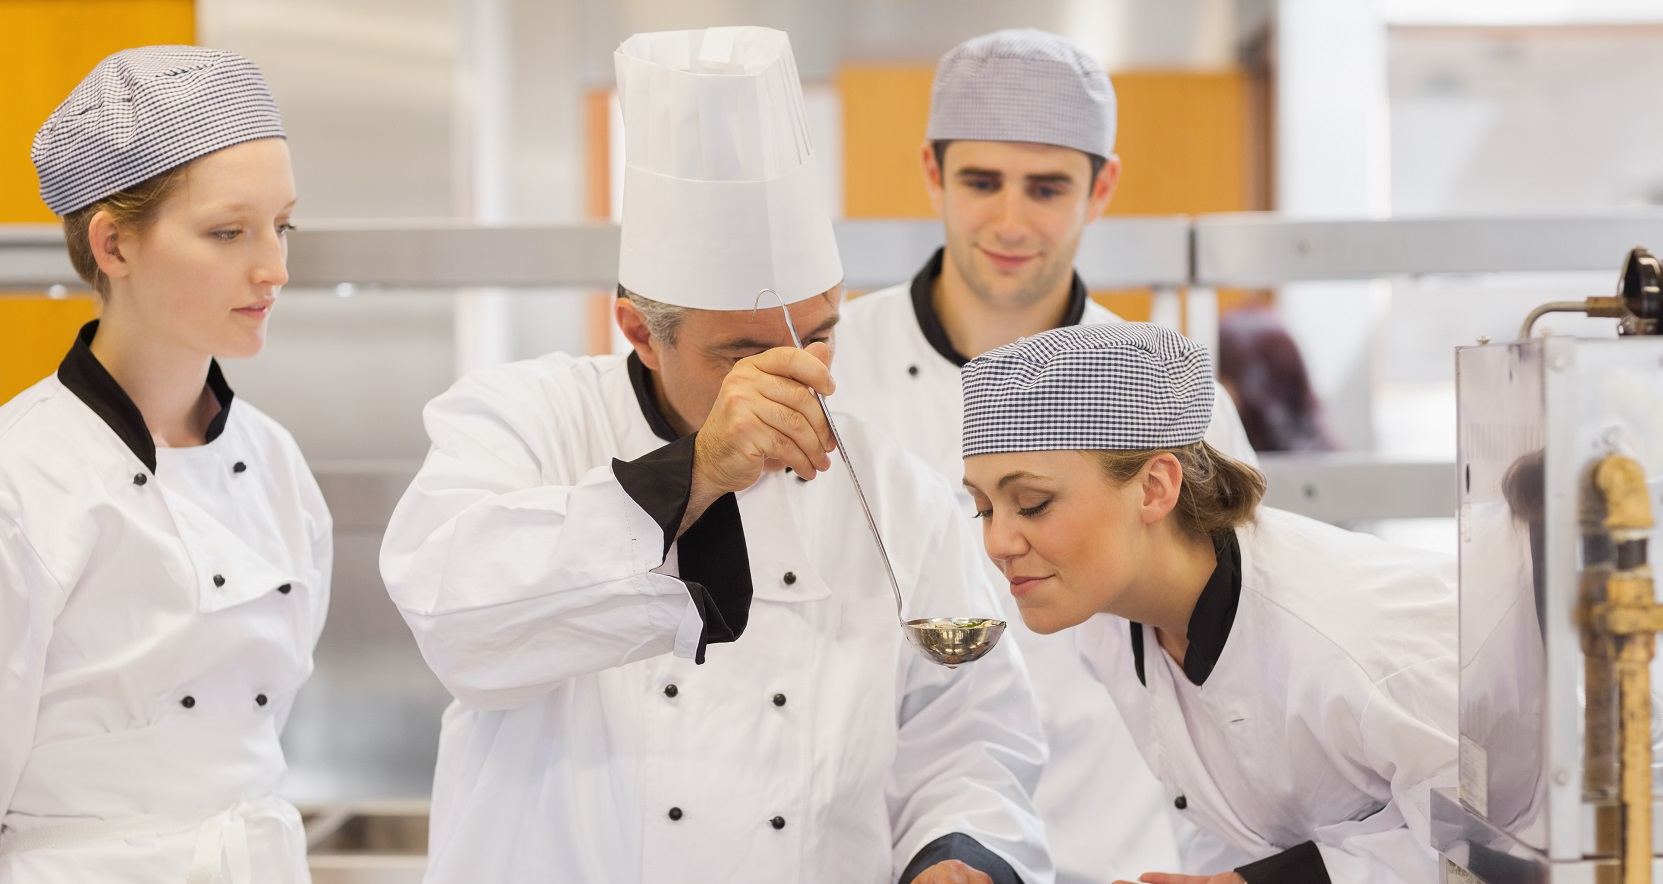 cth-level-2-award-culinary-skills-cover-img